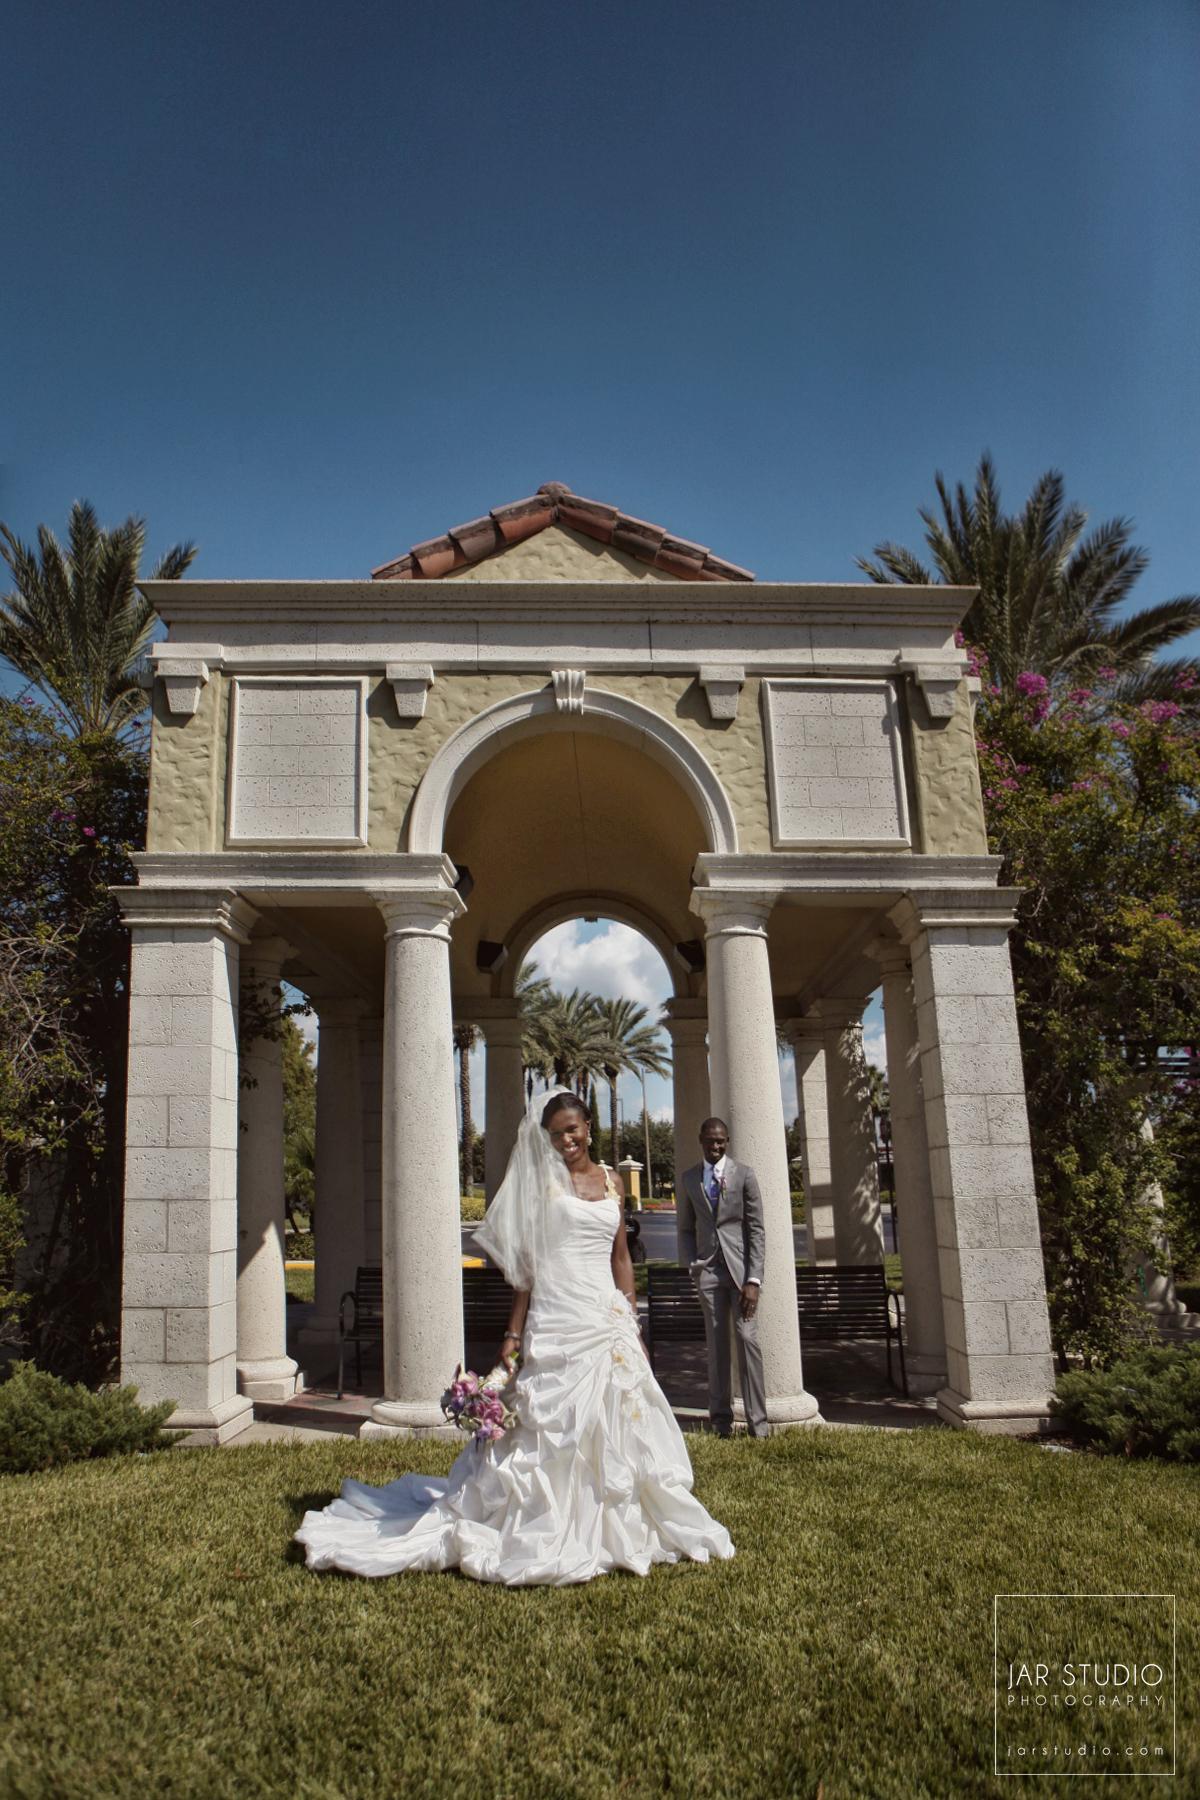 21-Hilton-Grand-Tuscany-Village-wedding-best-venues-orlando-fl-photographer-jarstudio.JPG